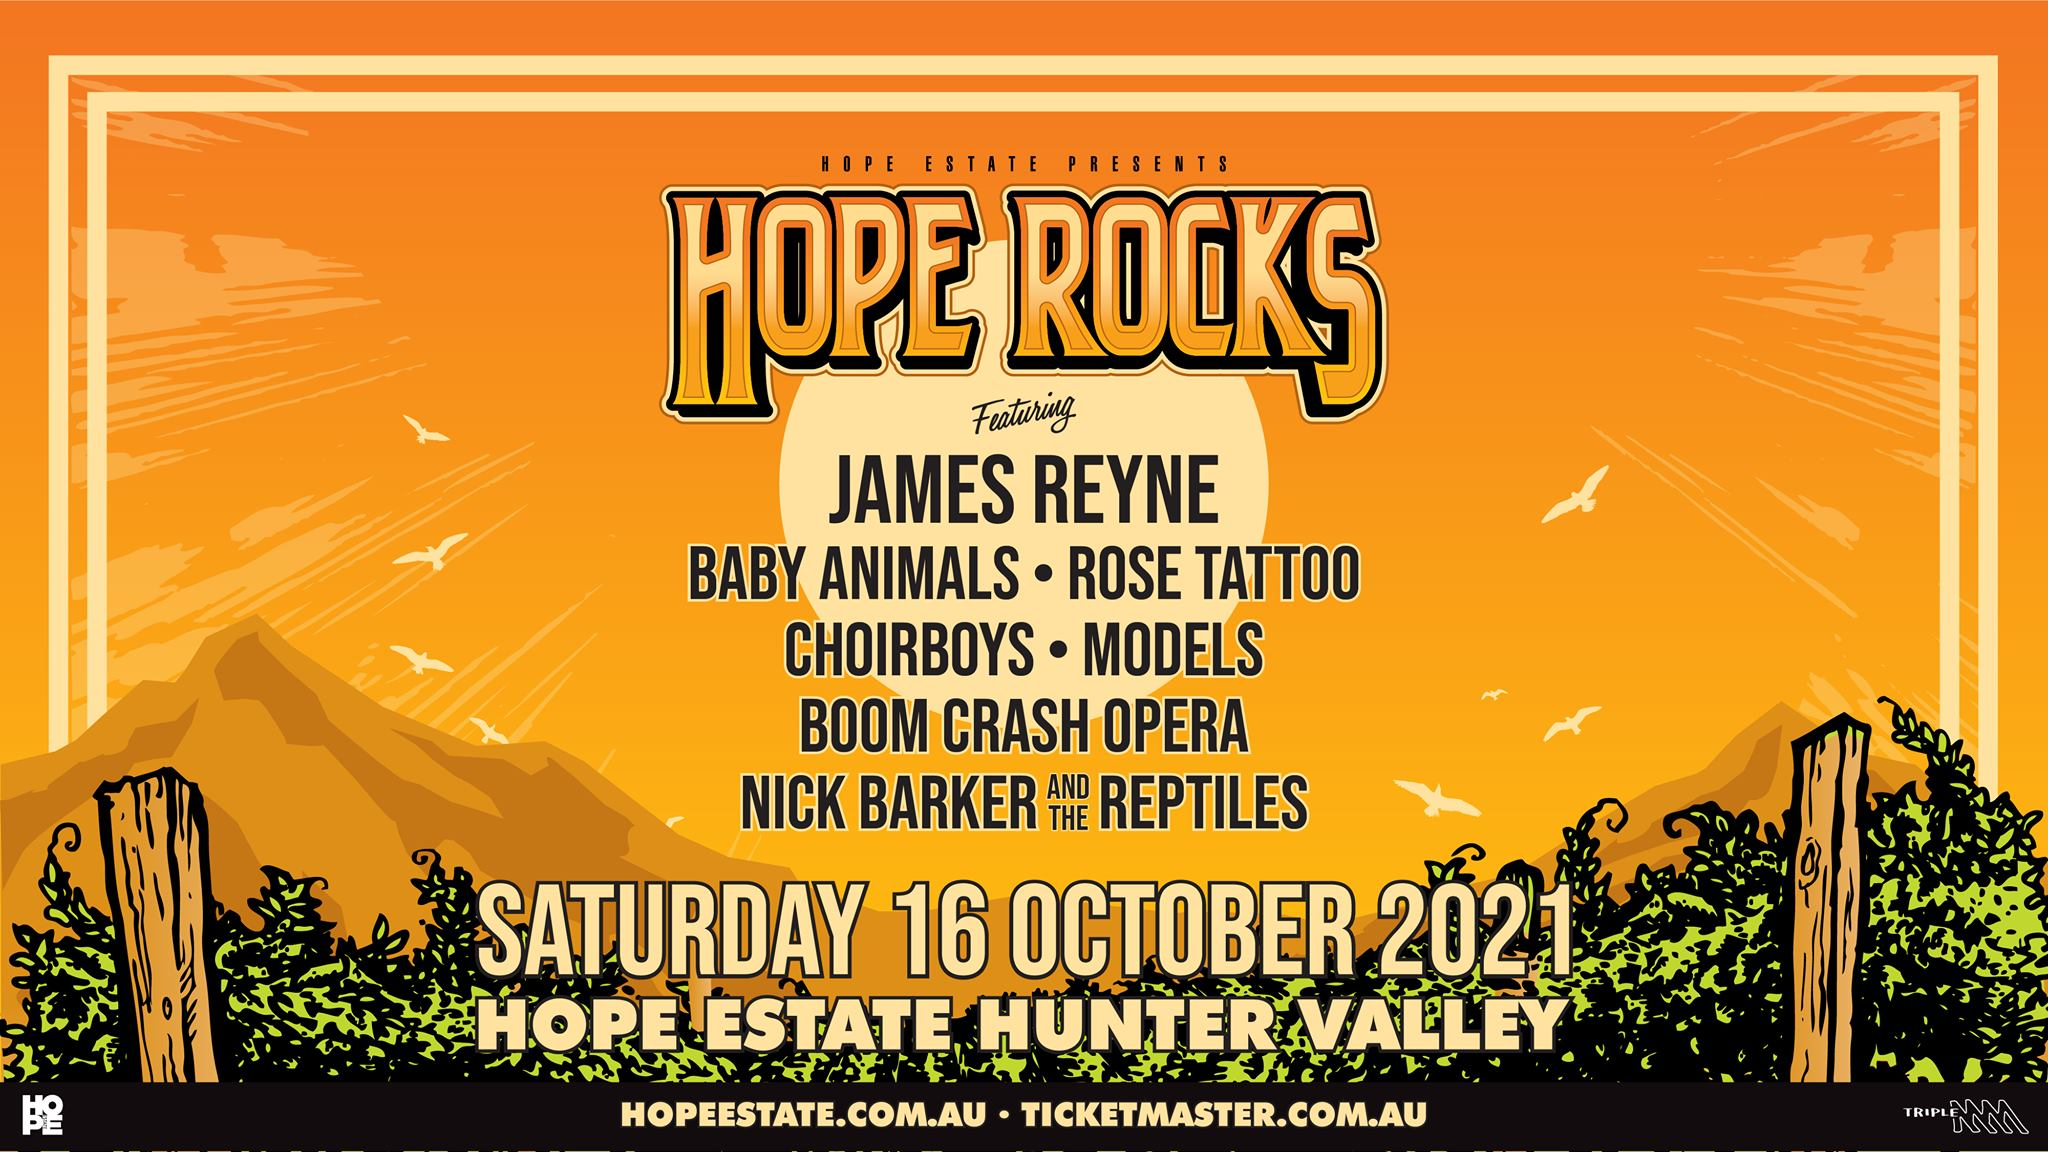 HOPE ROCKS 2021